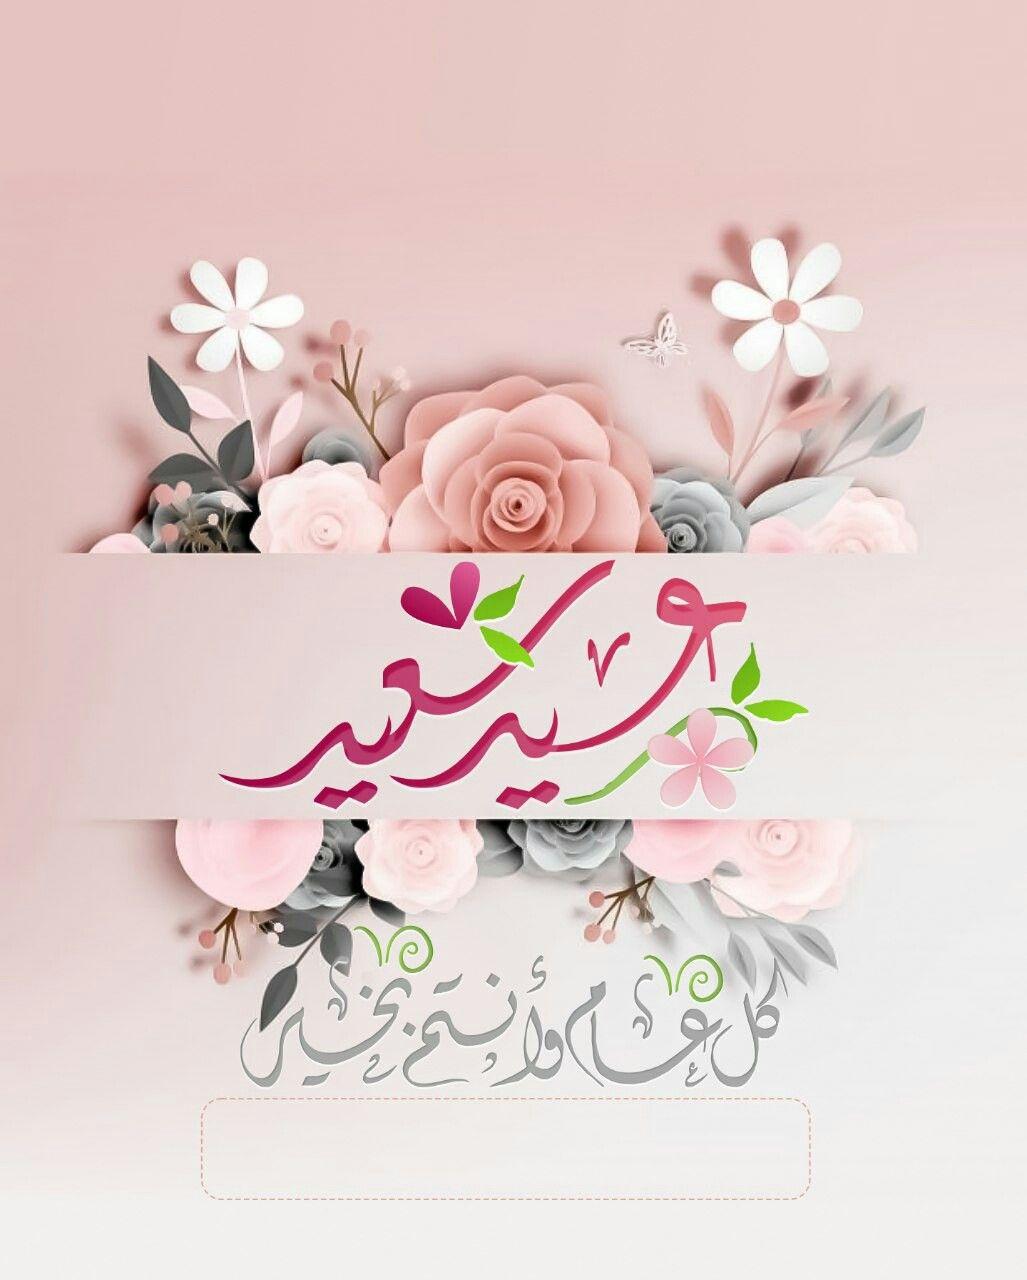 Pin By Miro Mar On عيدكم مبارك Eid Greetings Eid Mubarek Happy Eid